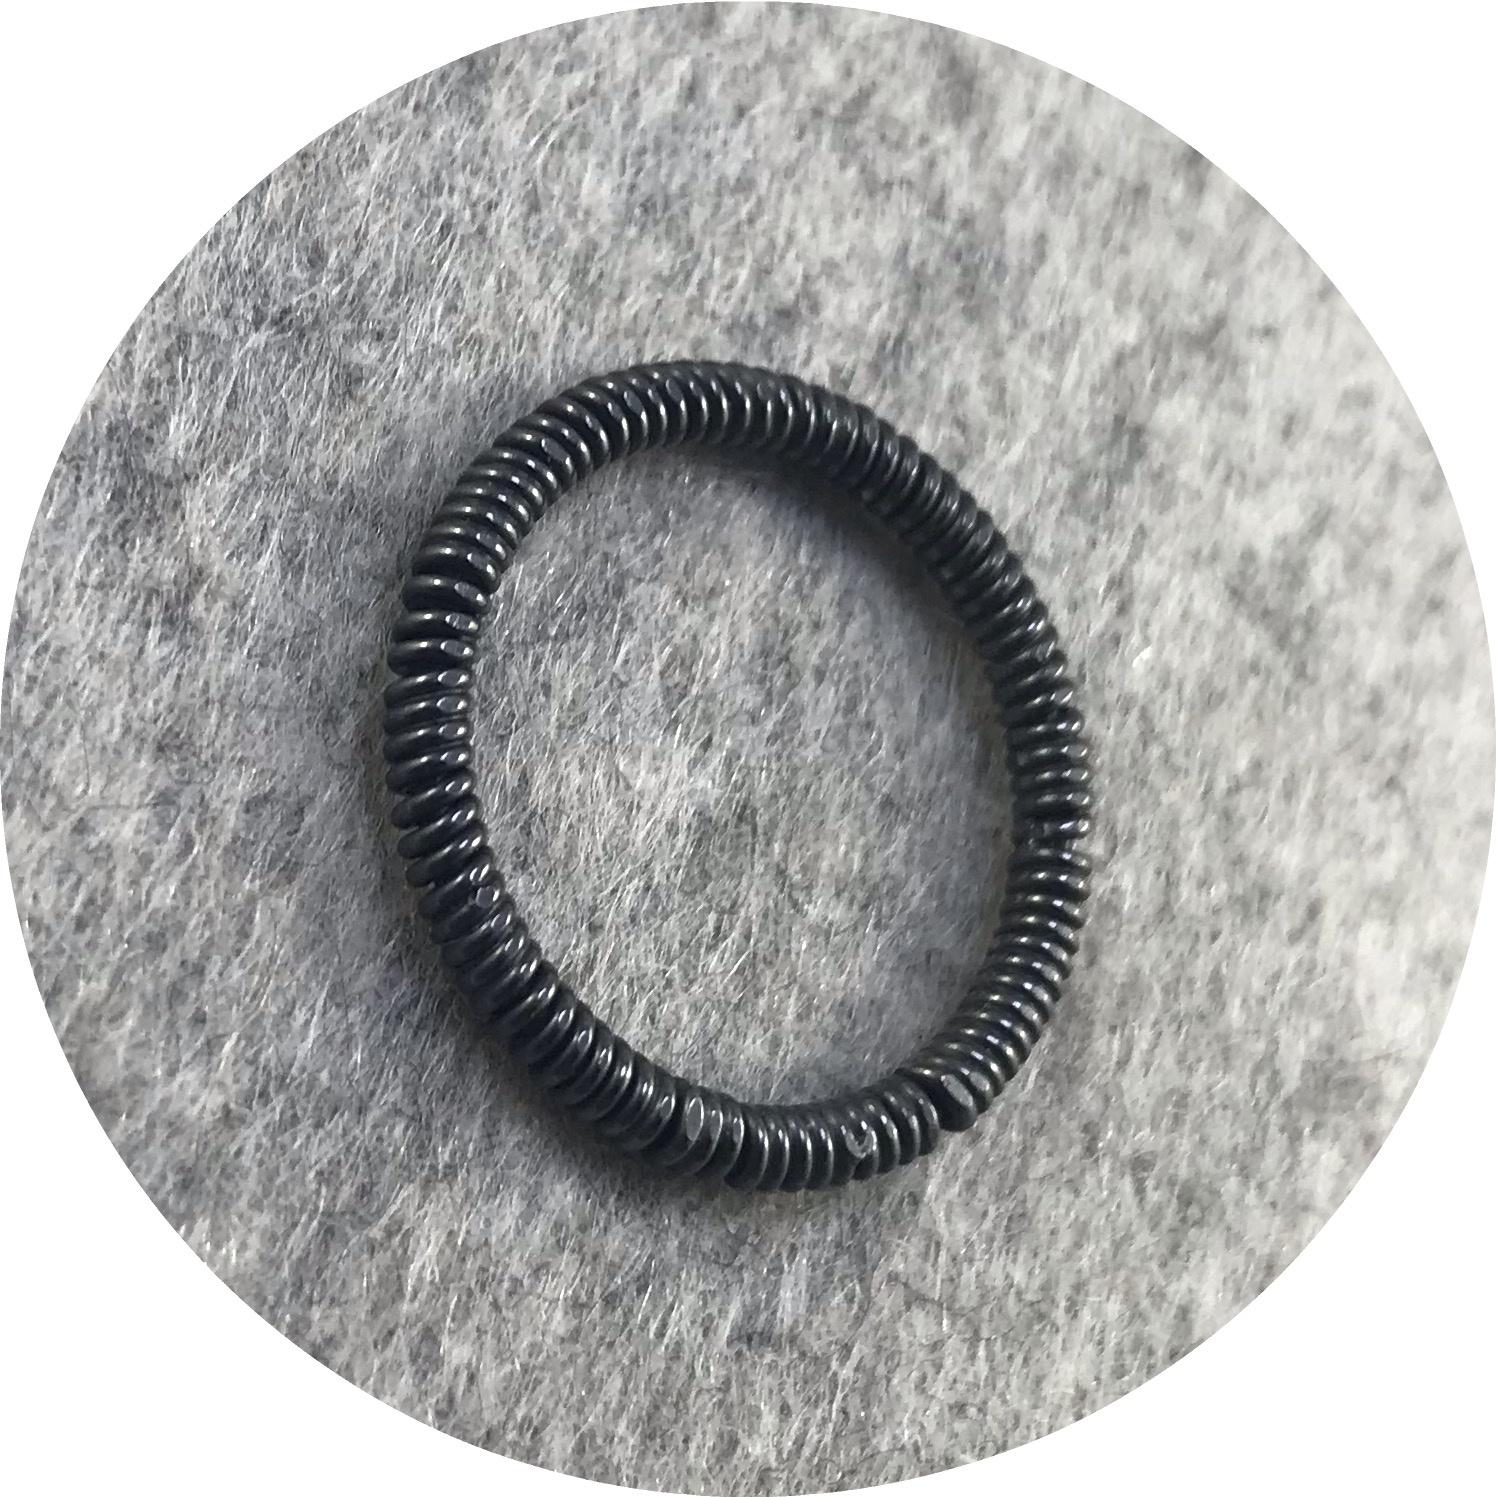 Laura Eyles - 'Rope Ring' oxidised 925 silver M